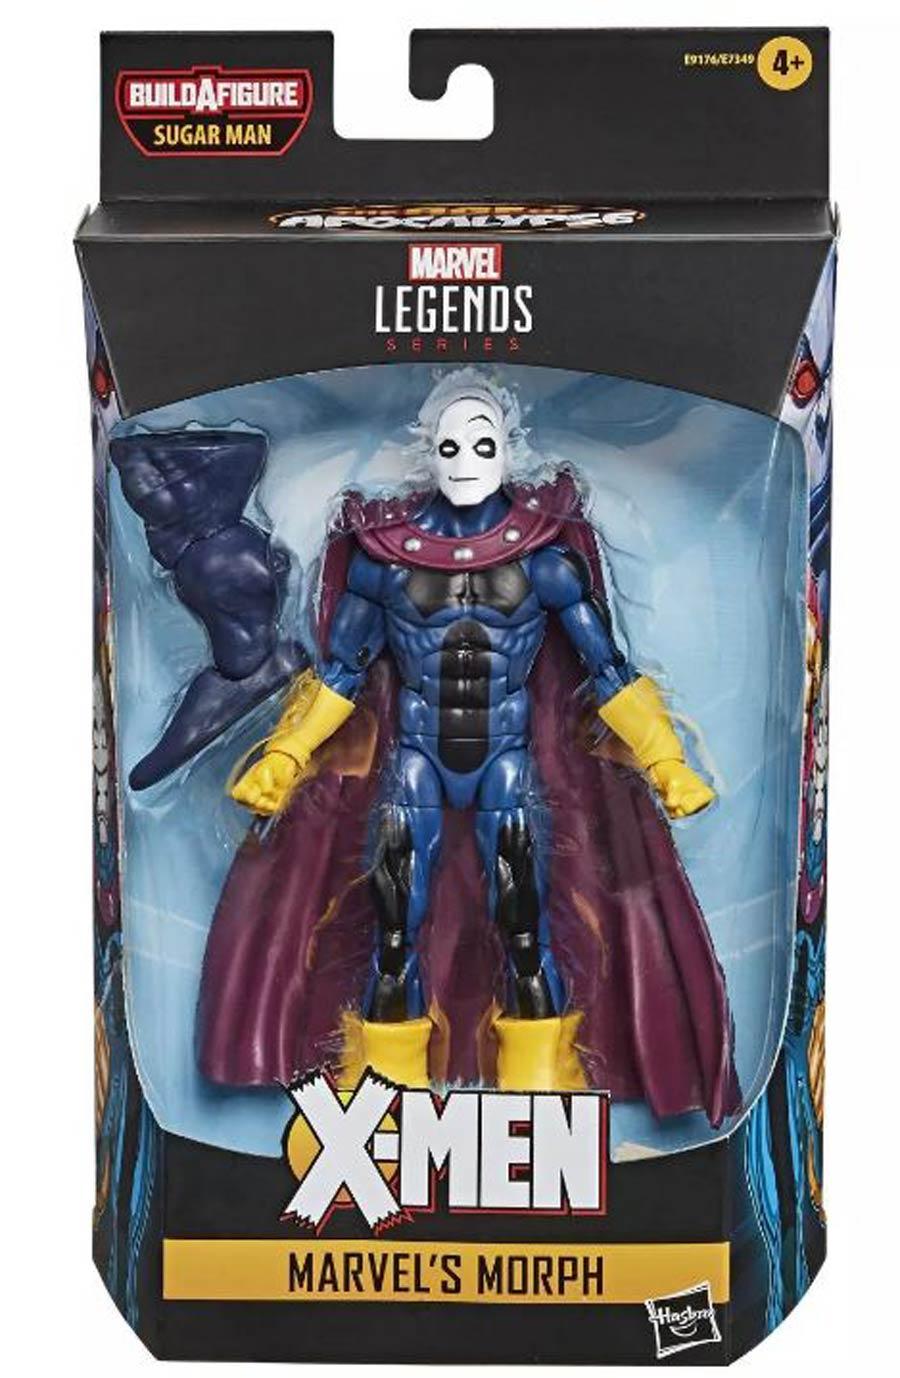 Marvel X-Men Legends Age Of Apocalypse 2020 6-Inch Action Figure - Marvels Morph